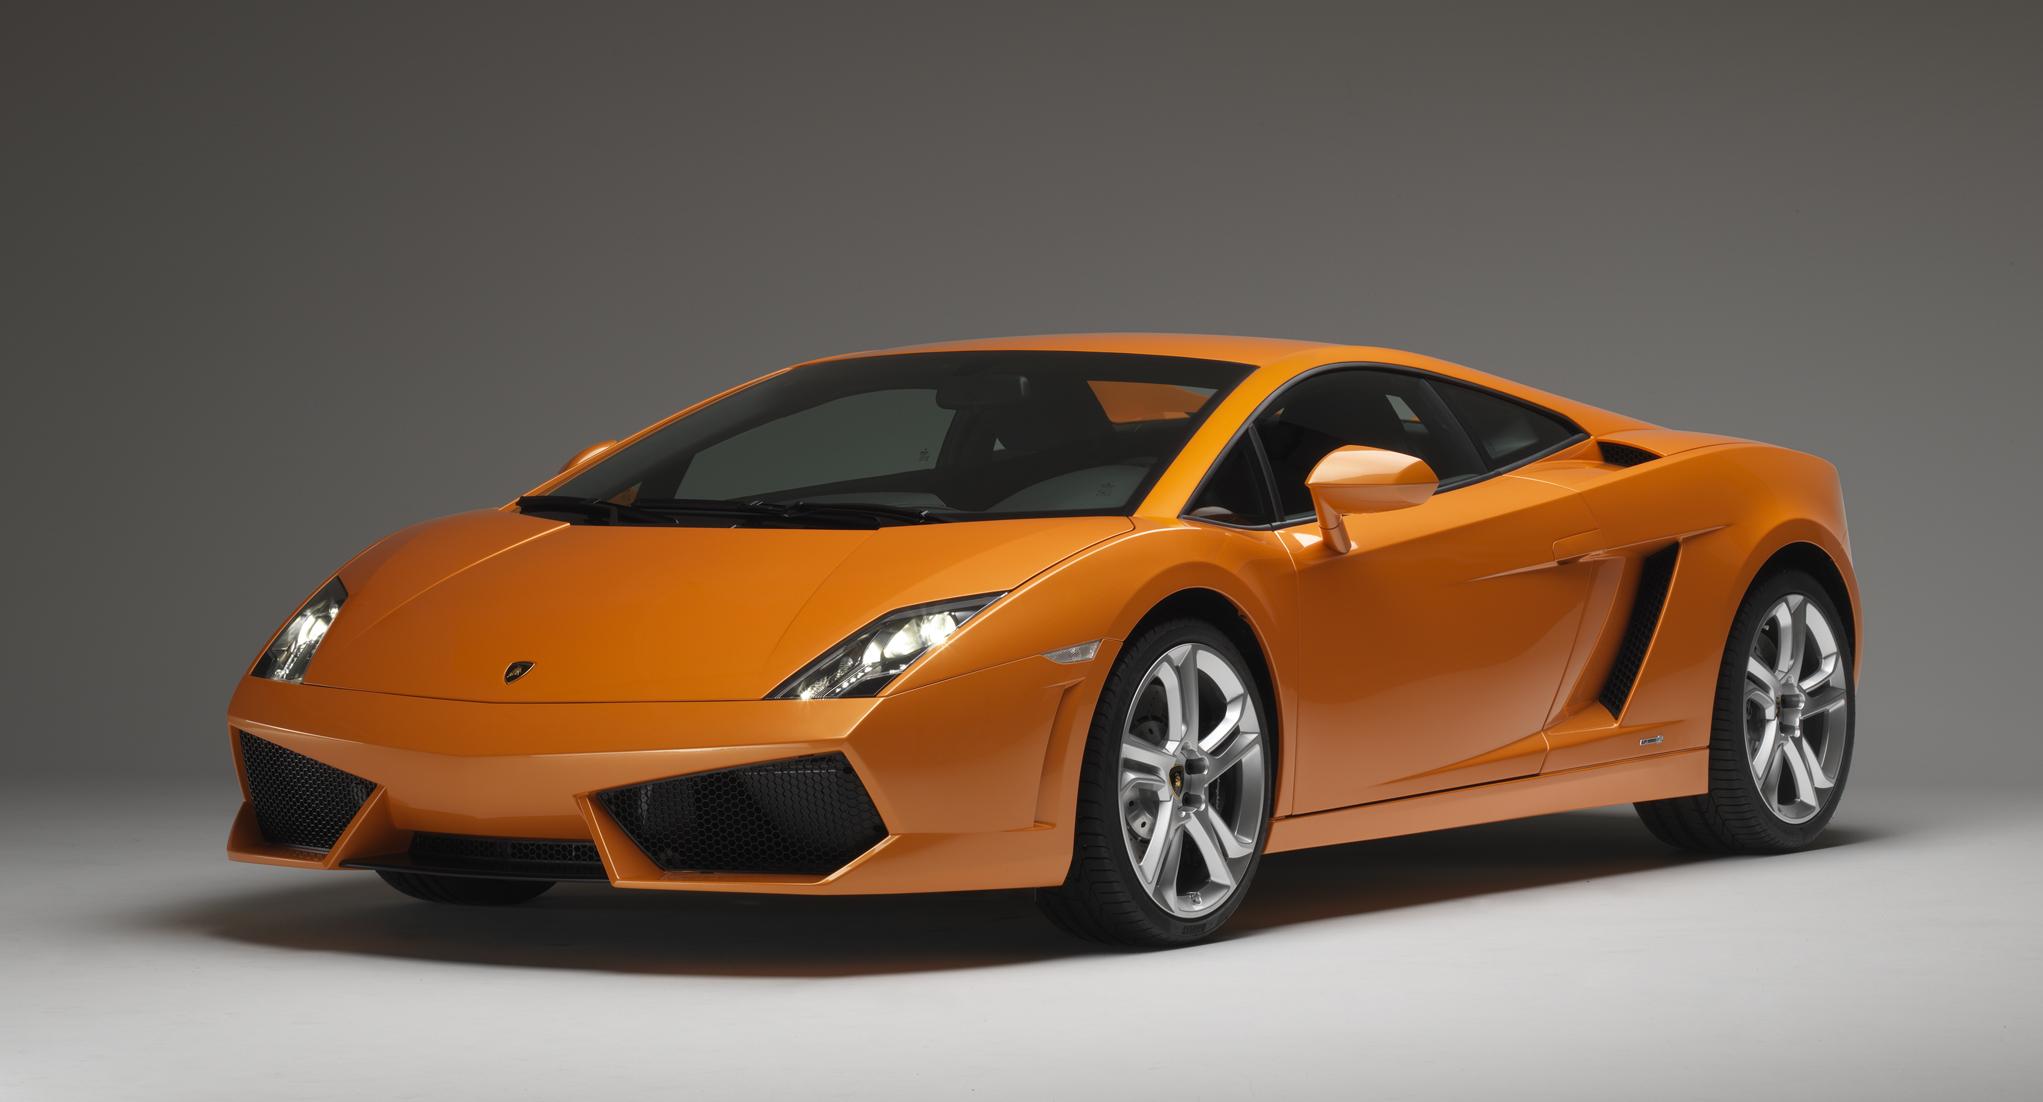 Lamborghini Gallardo LP front 3/4